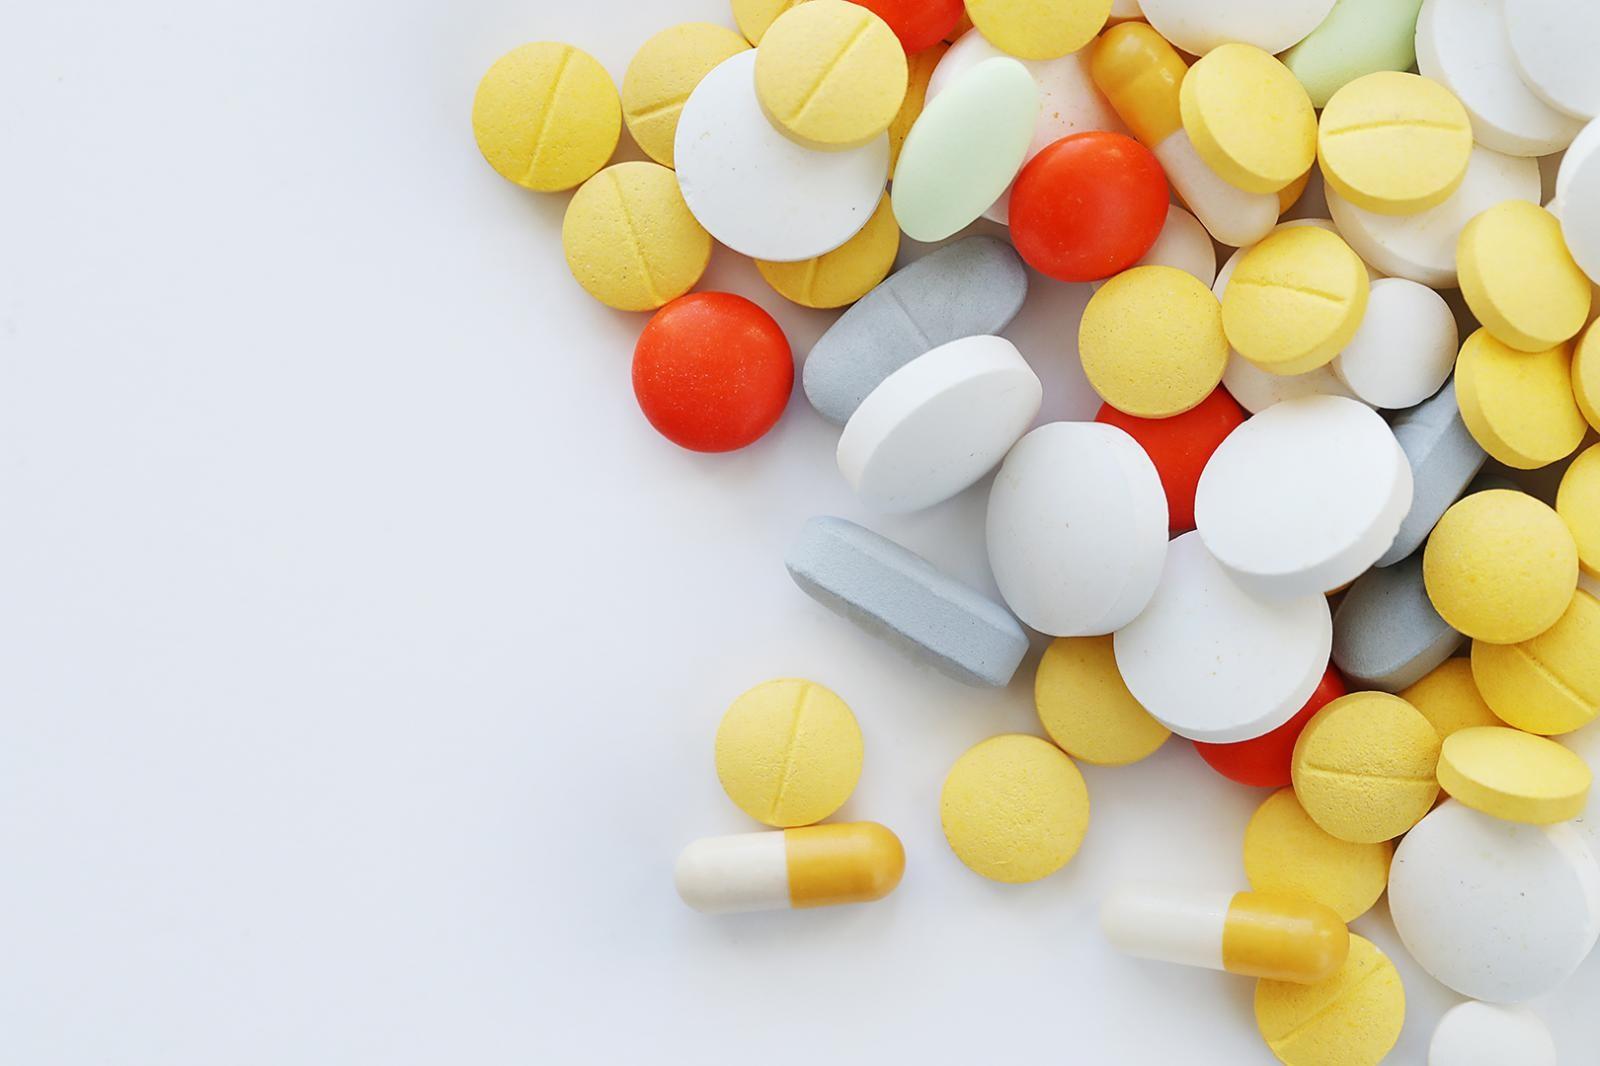 Por Que Tomar Medicamentos Por Conta Própria É Perigoso?